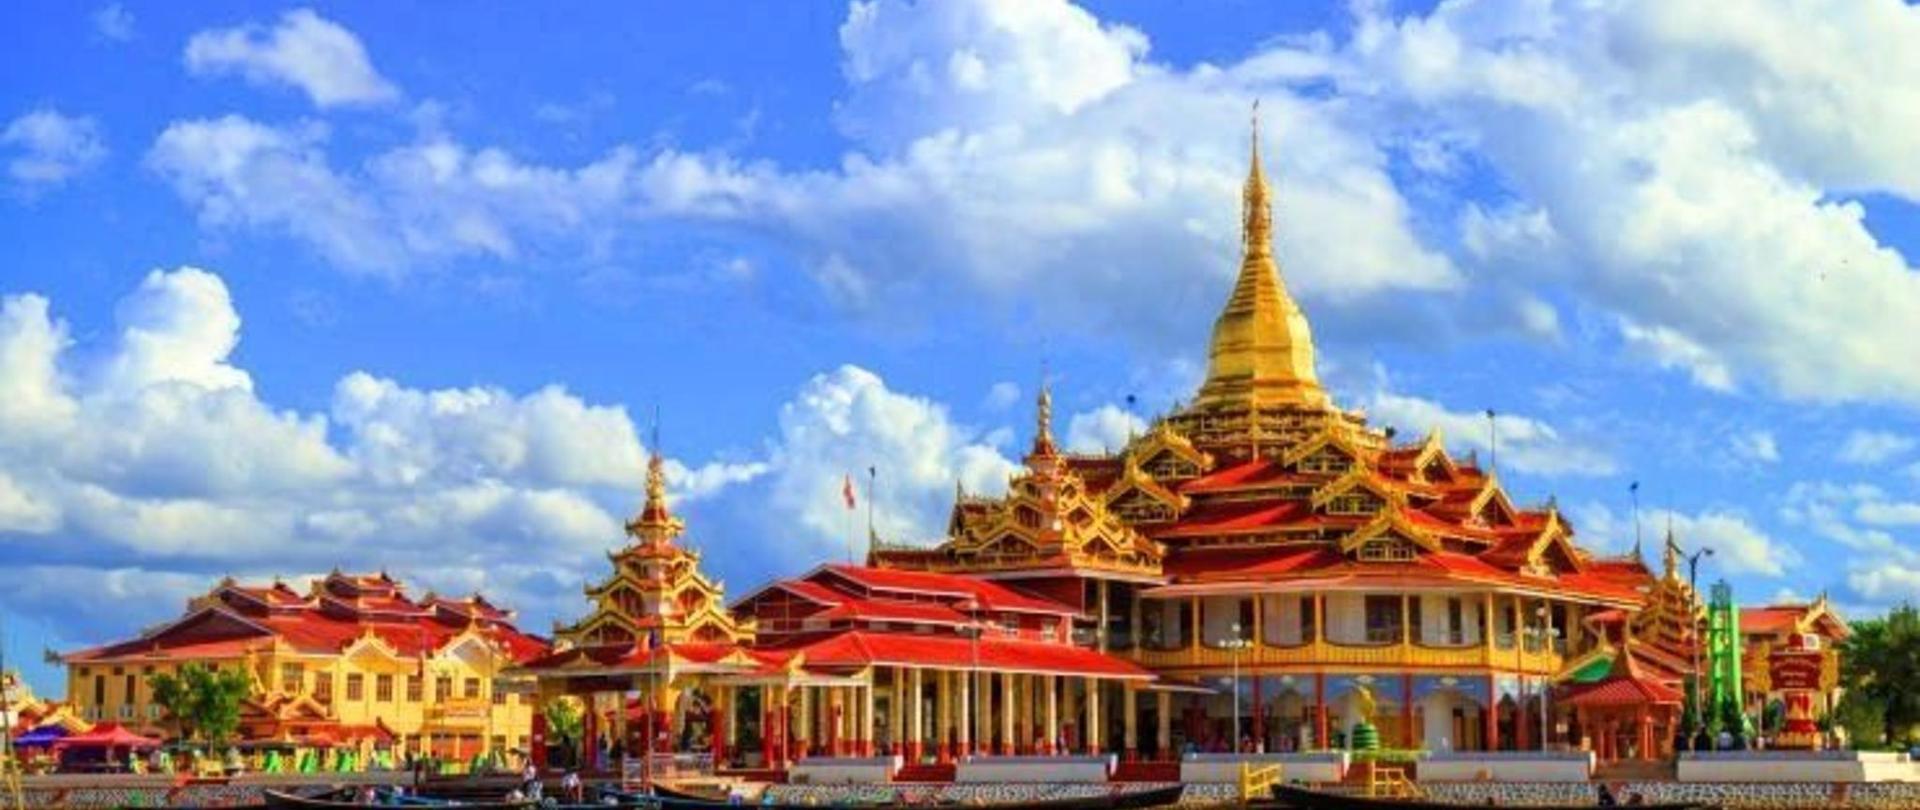 568_myanmar-phaung-daw-oo-pagoda.jpeg